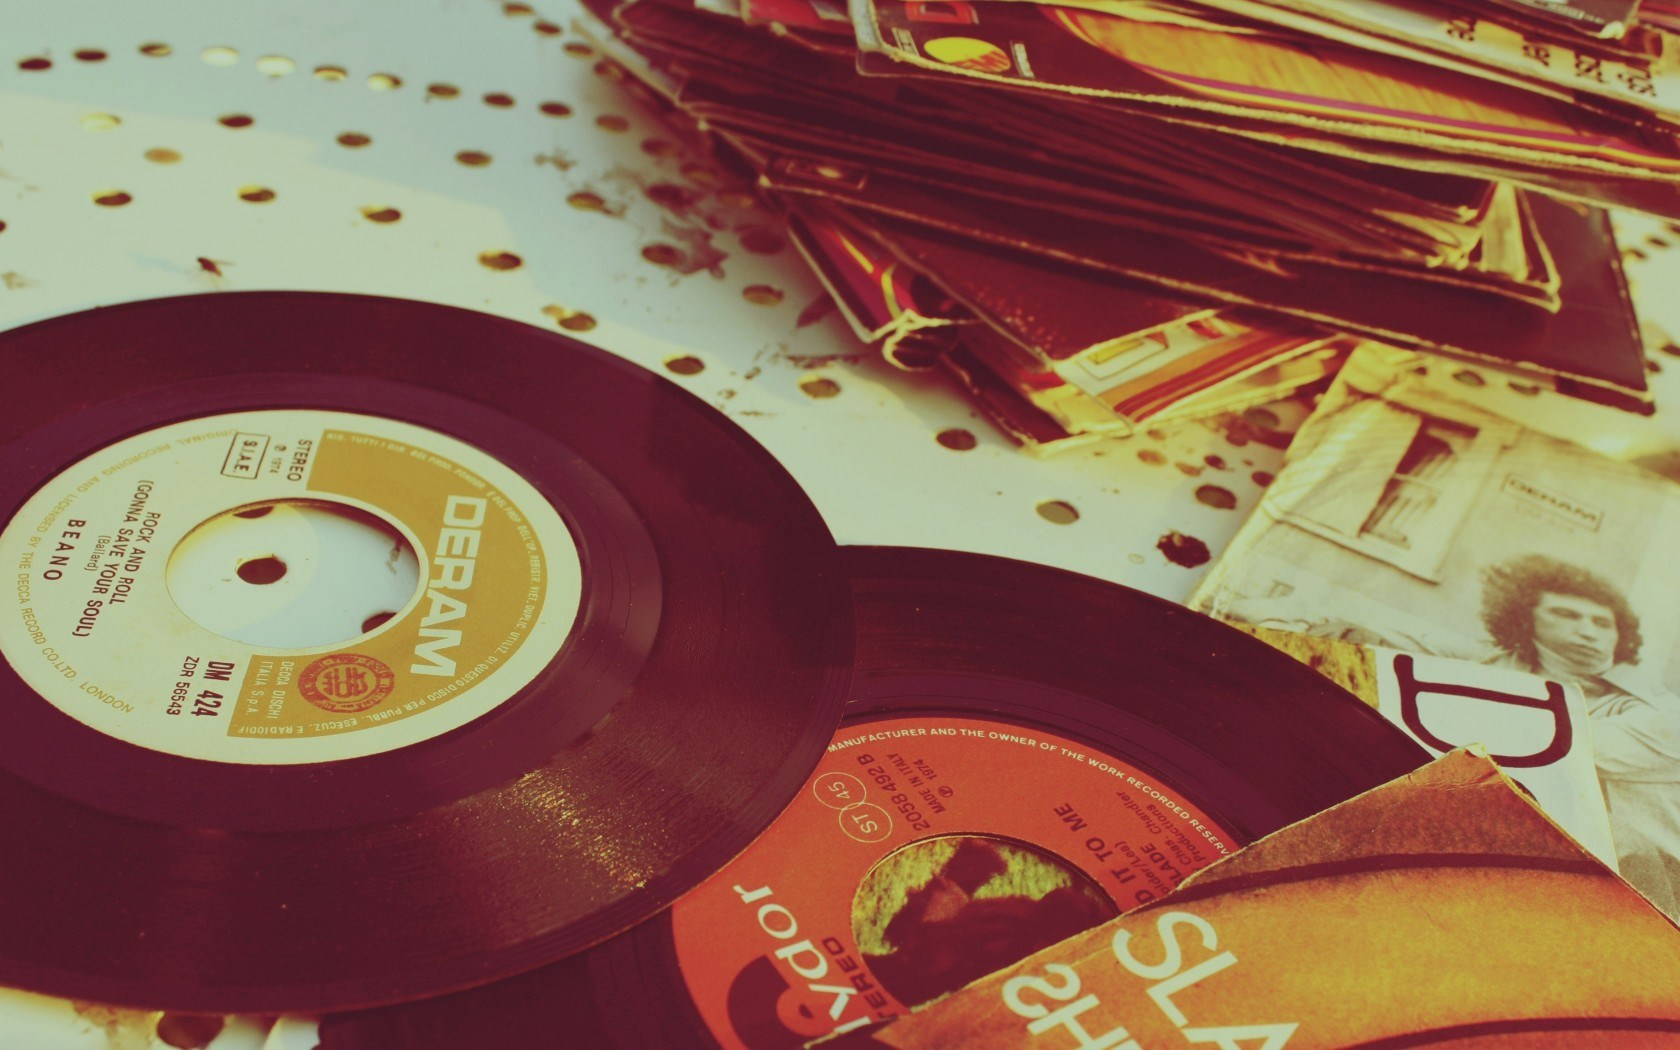 cd-classic-dream-hd-wallpaper-photovintage-record-vinyl – the